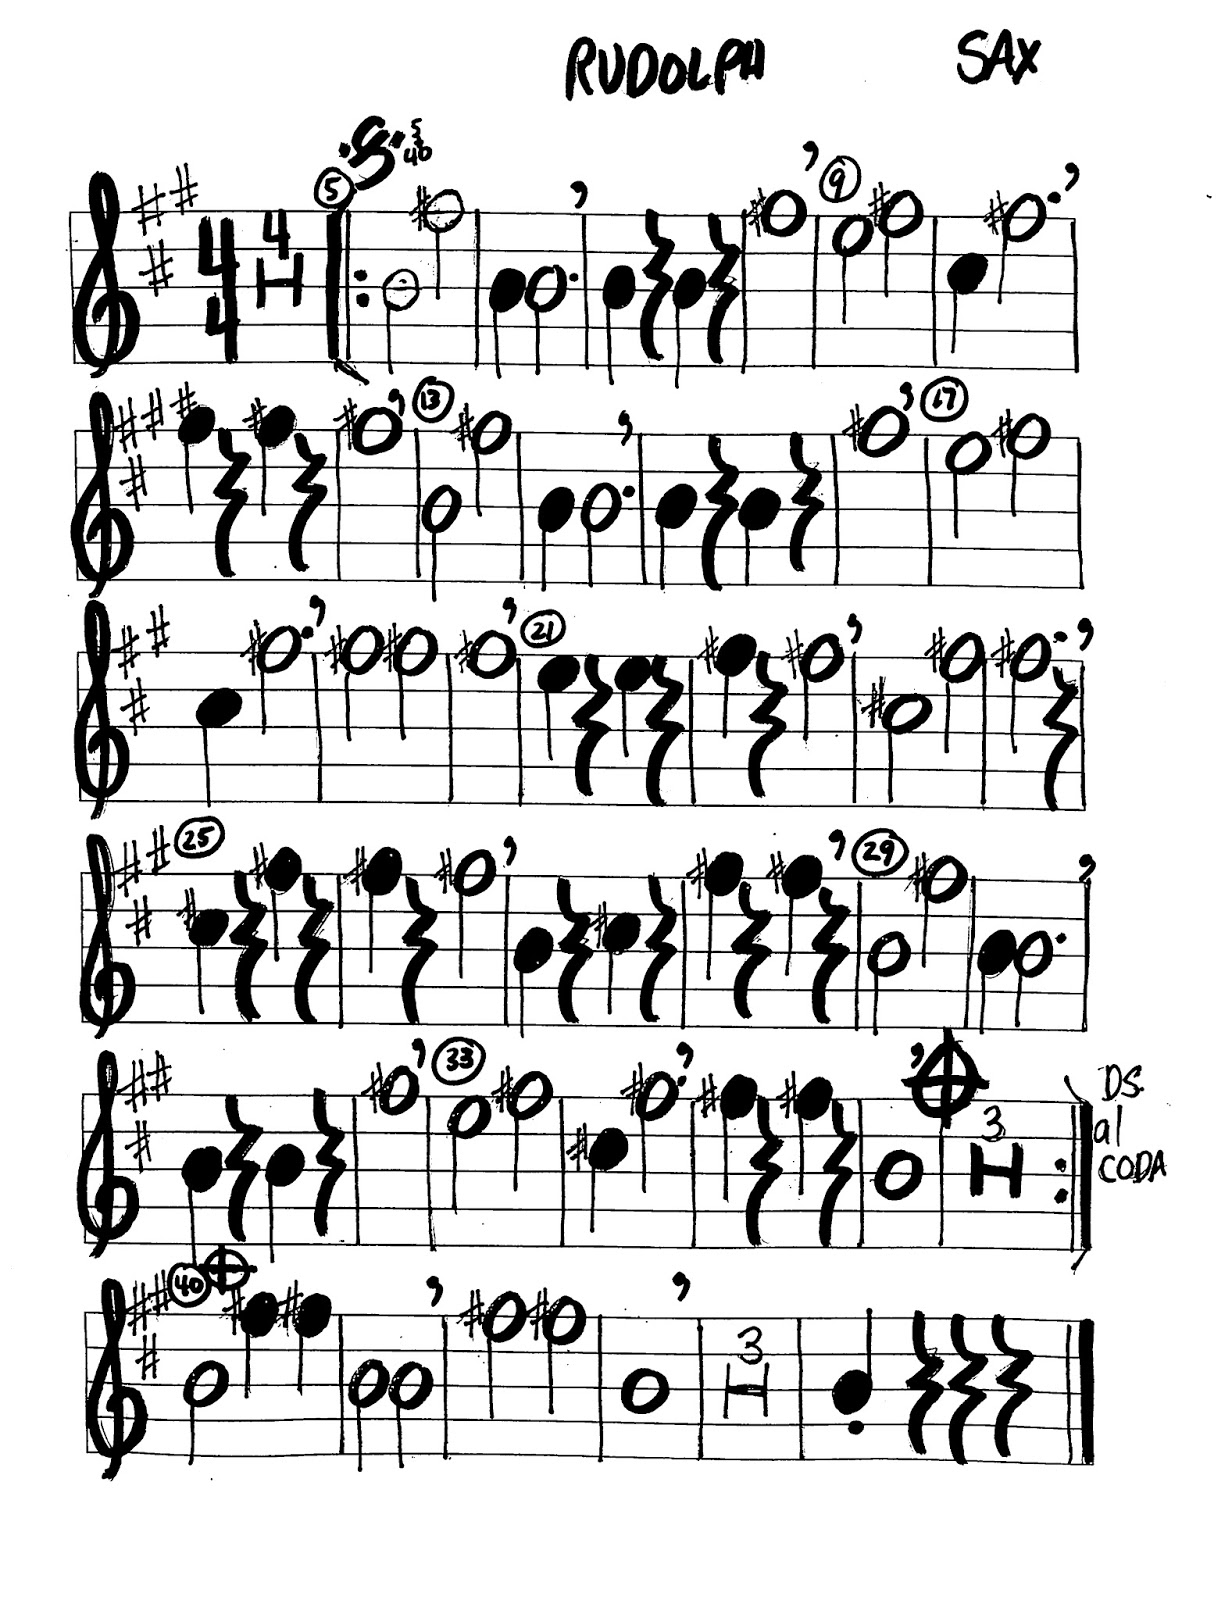 Miss Jacobson's Music: WINTER CONCERT MUSIC 2013: RUDOLPH